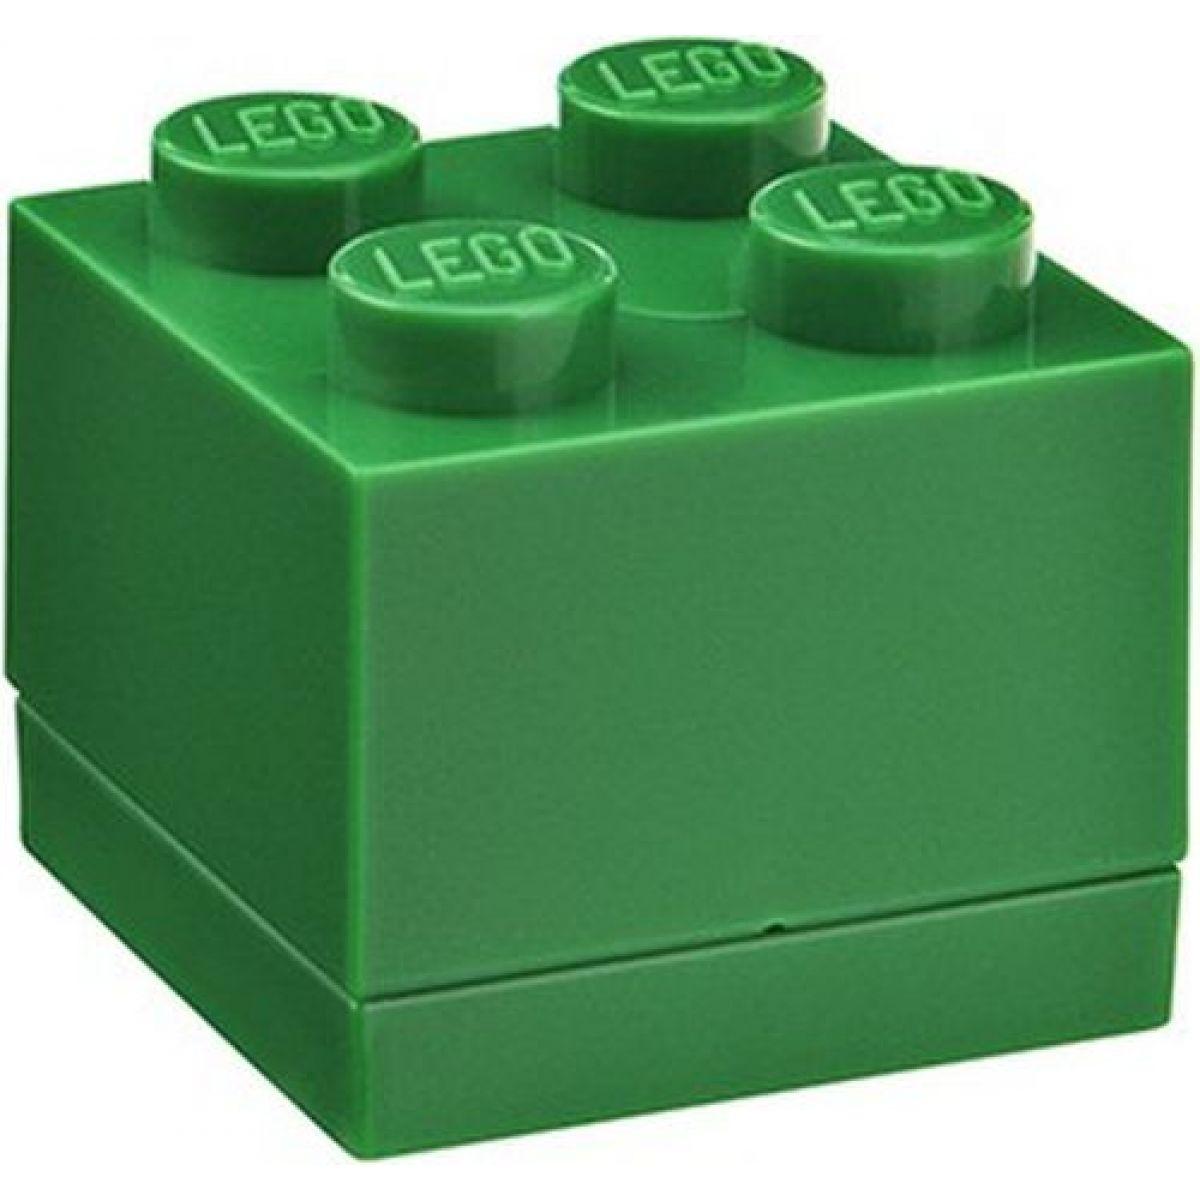 LEGO Mini Box 46x46x51 mm - Zelený